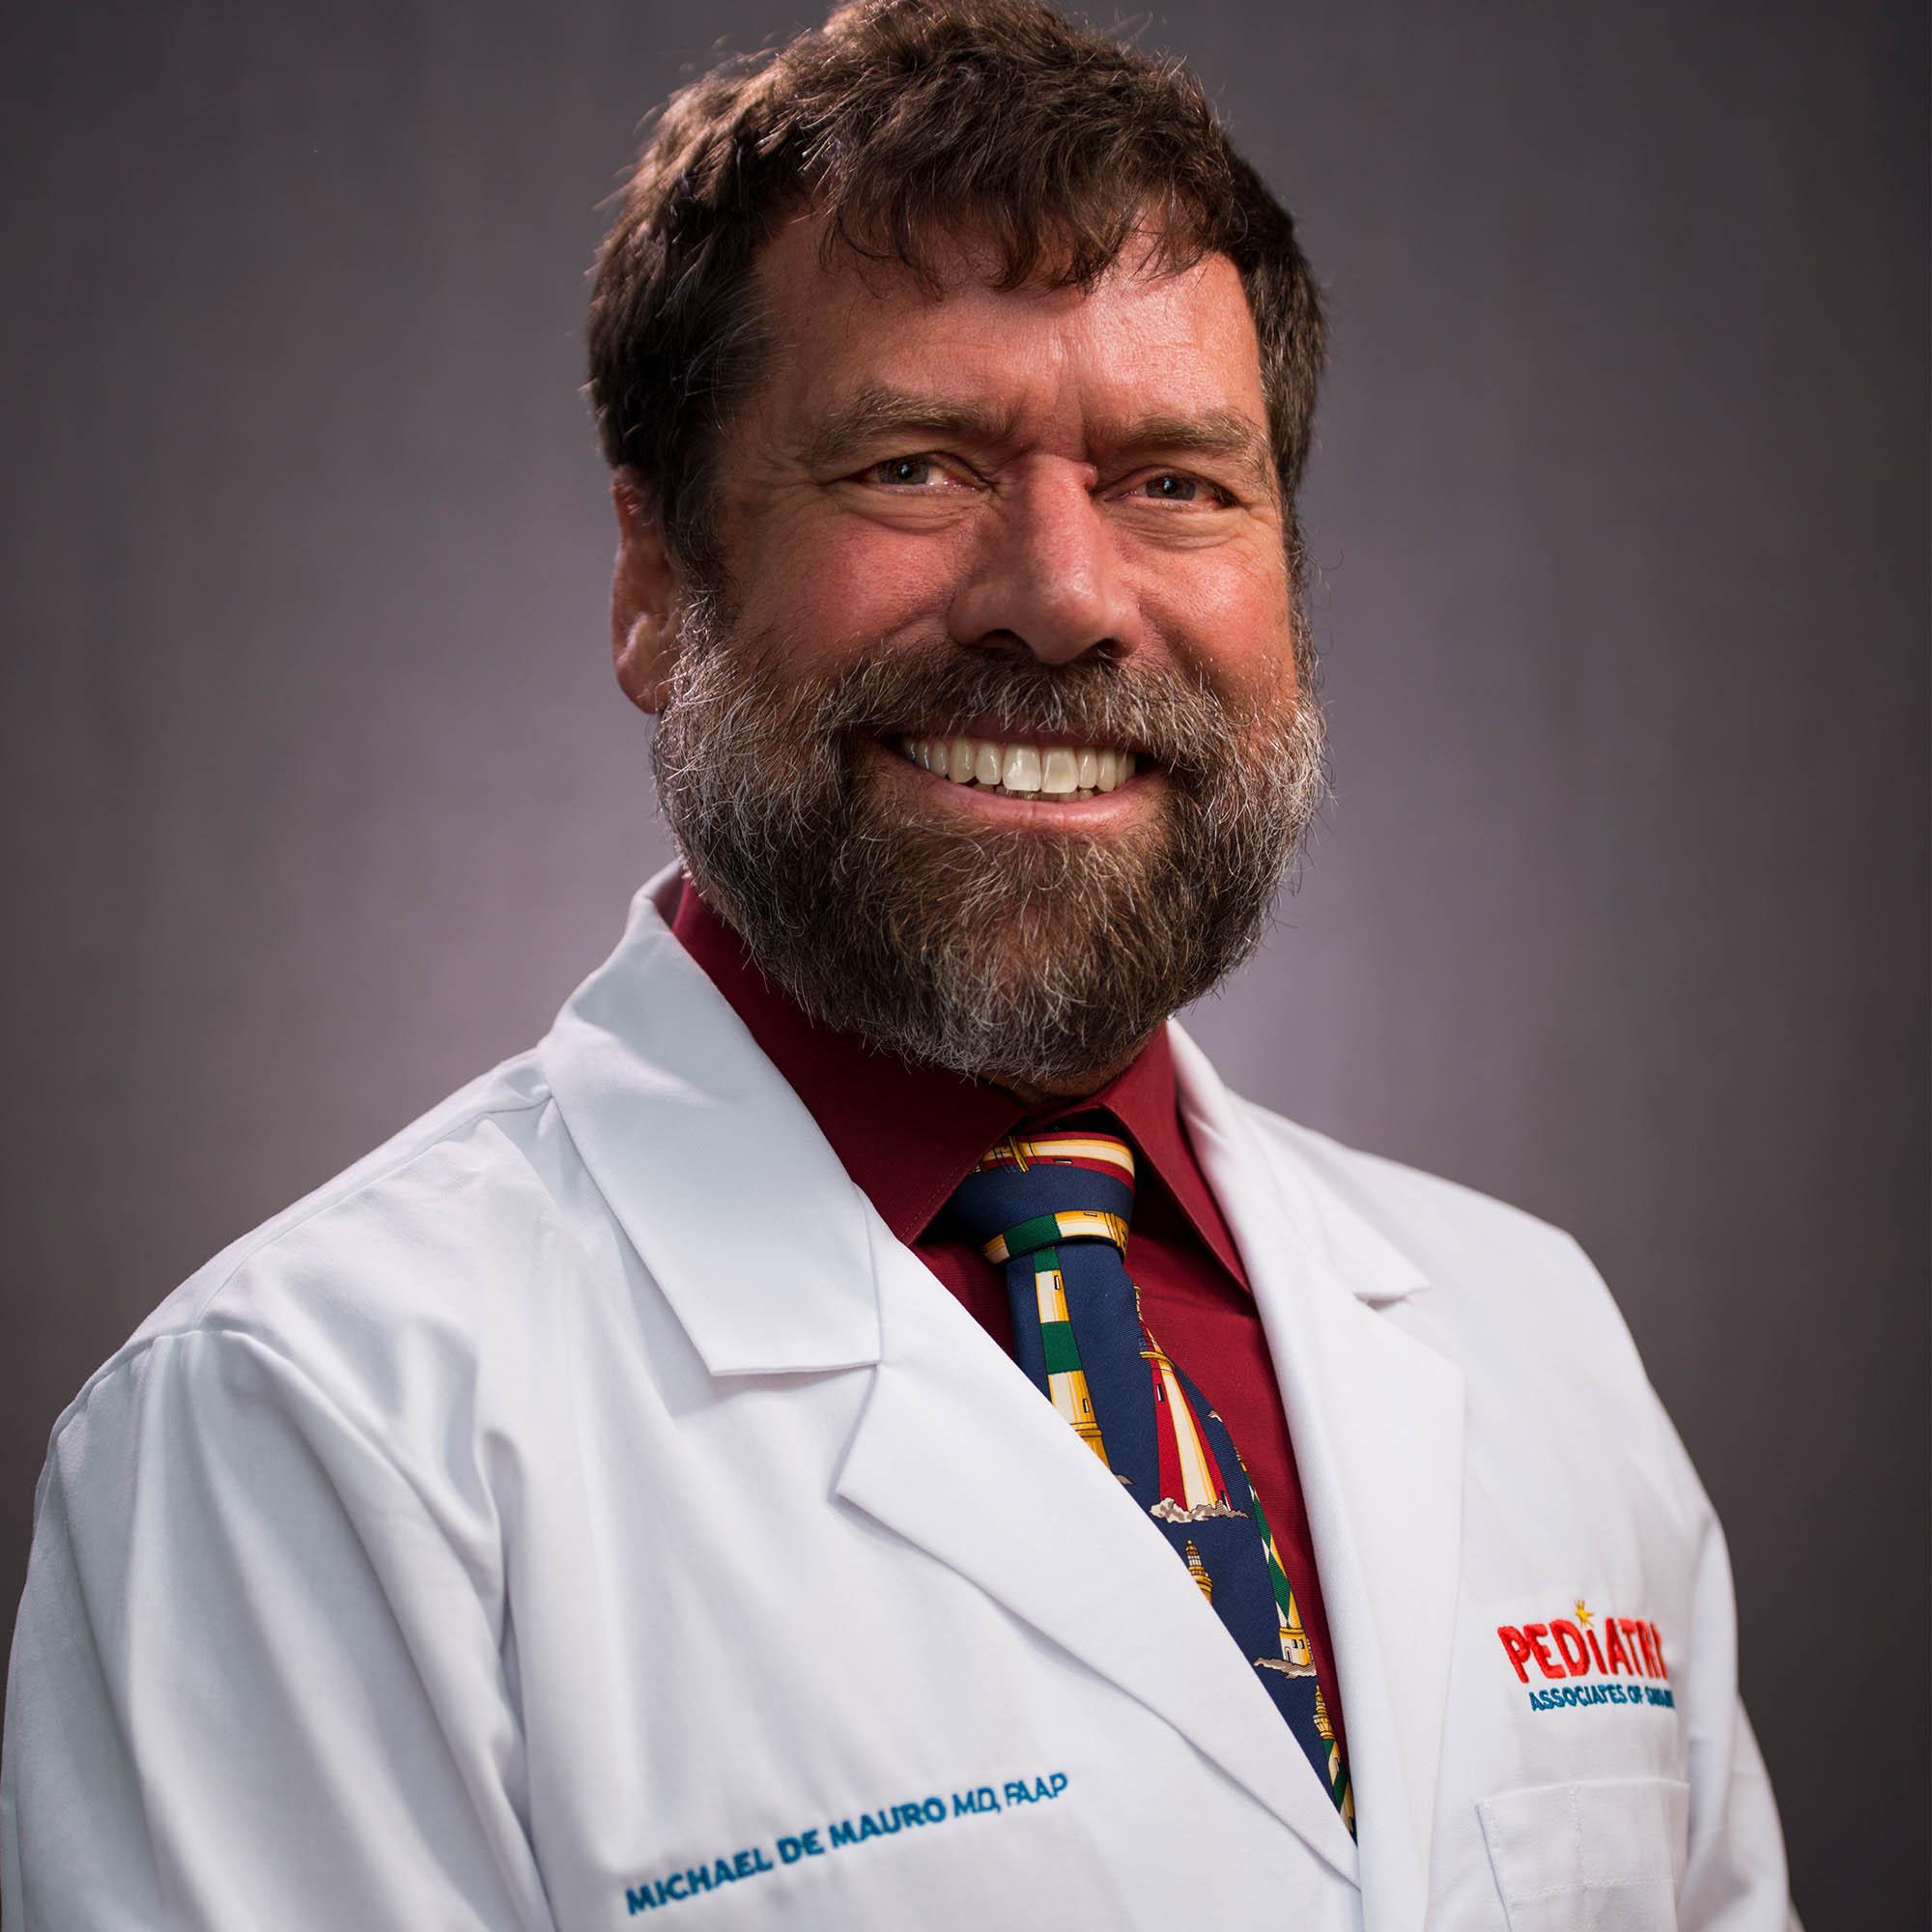 Dr. Michael D. DeMauro